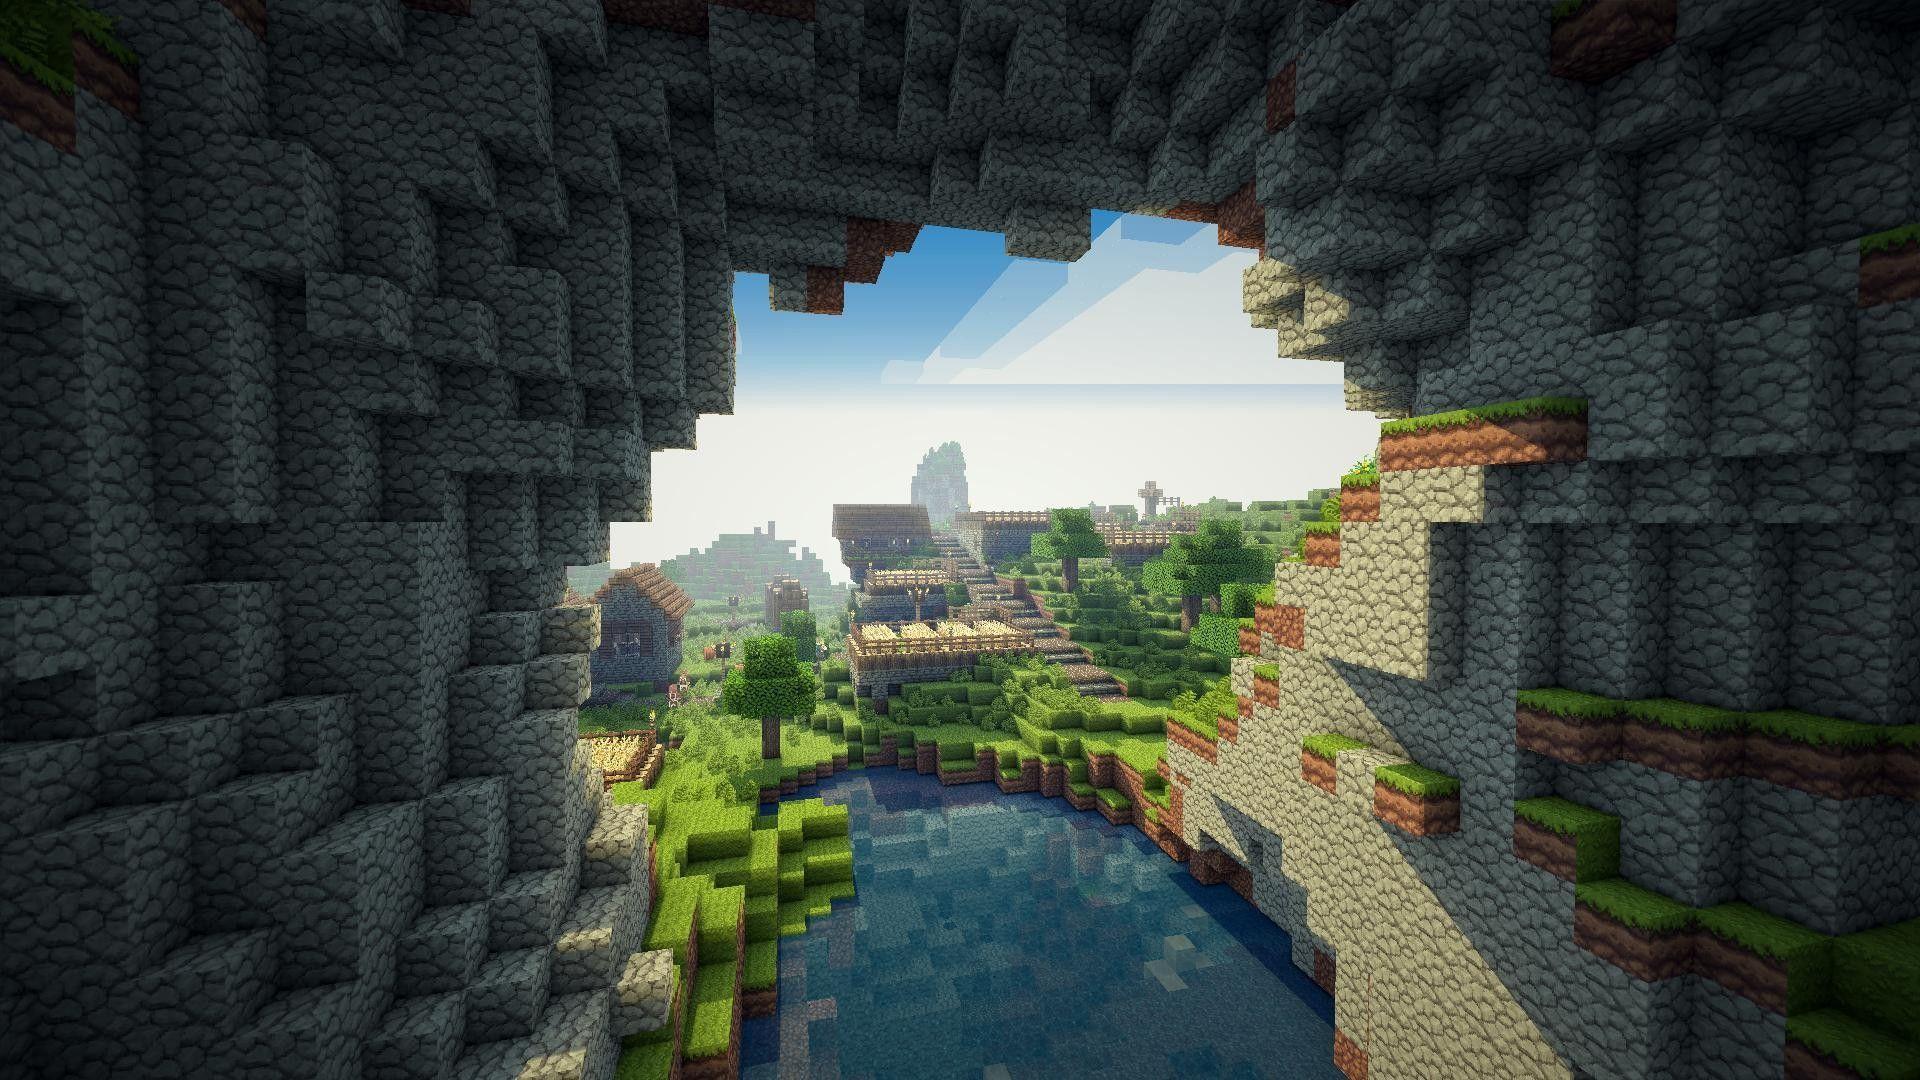 Minecraft Wallpaper Hd 1920x1080 Minecraft Wallpapers 1920x1080 Wallpaper Cave